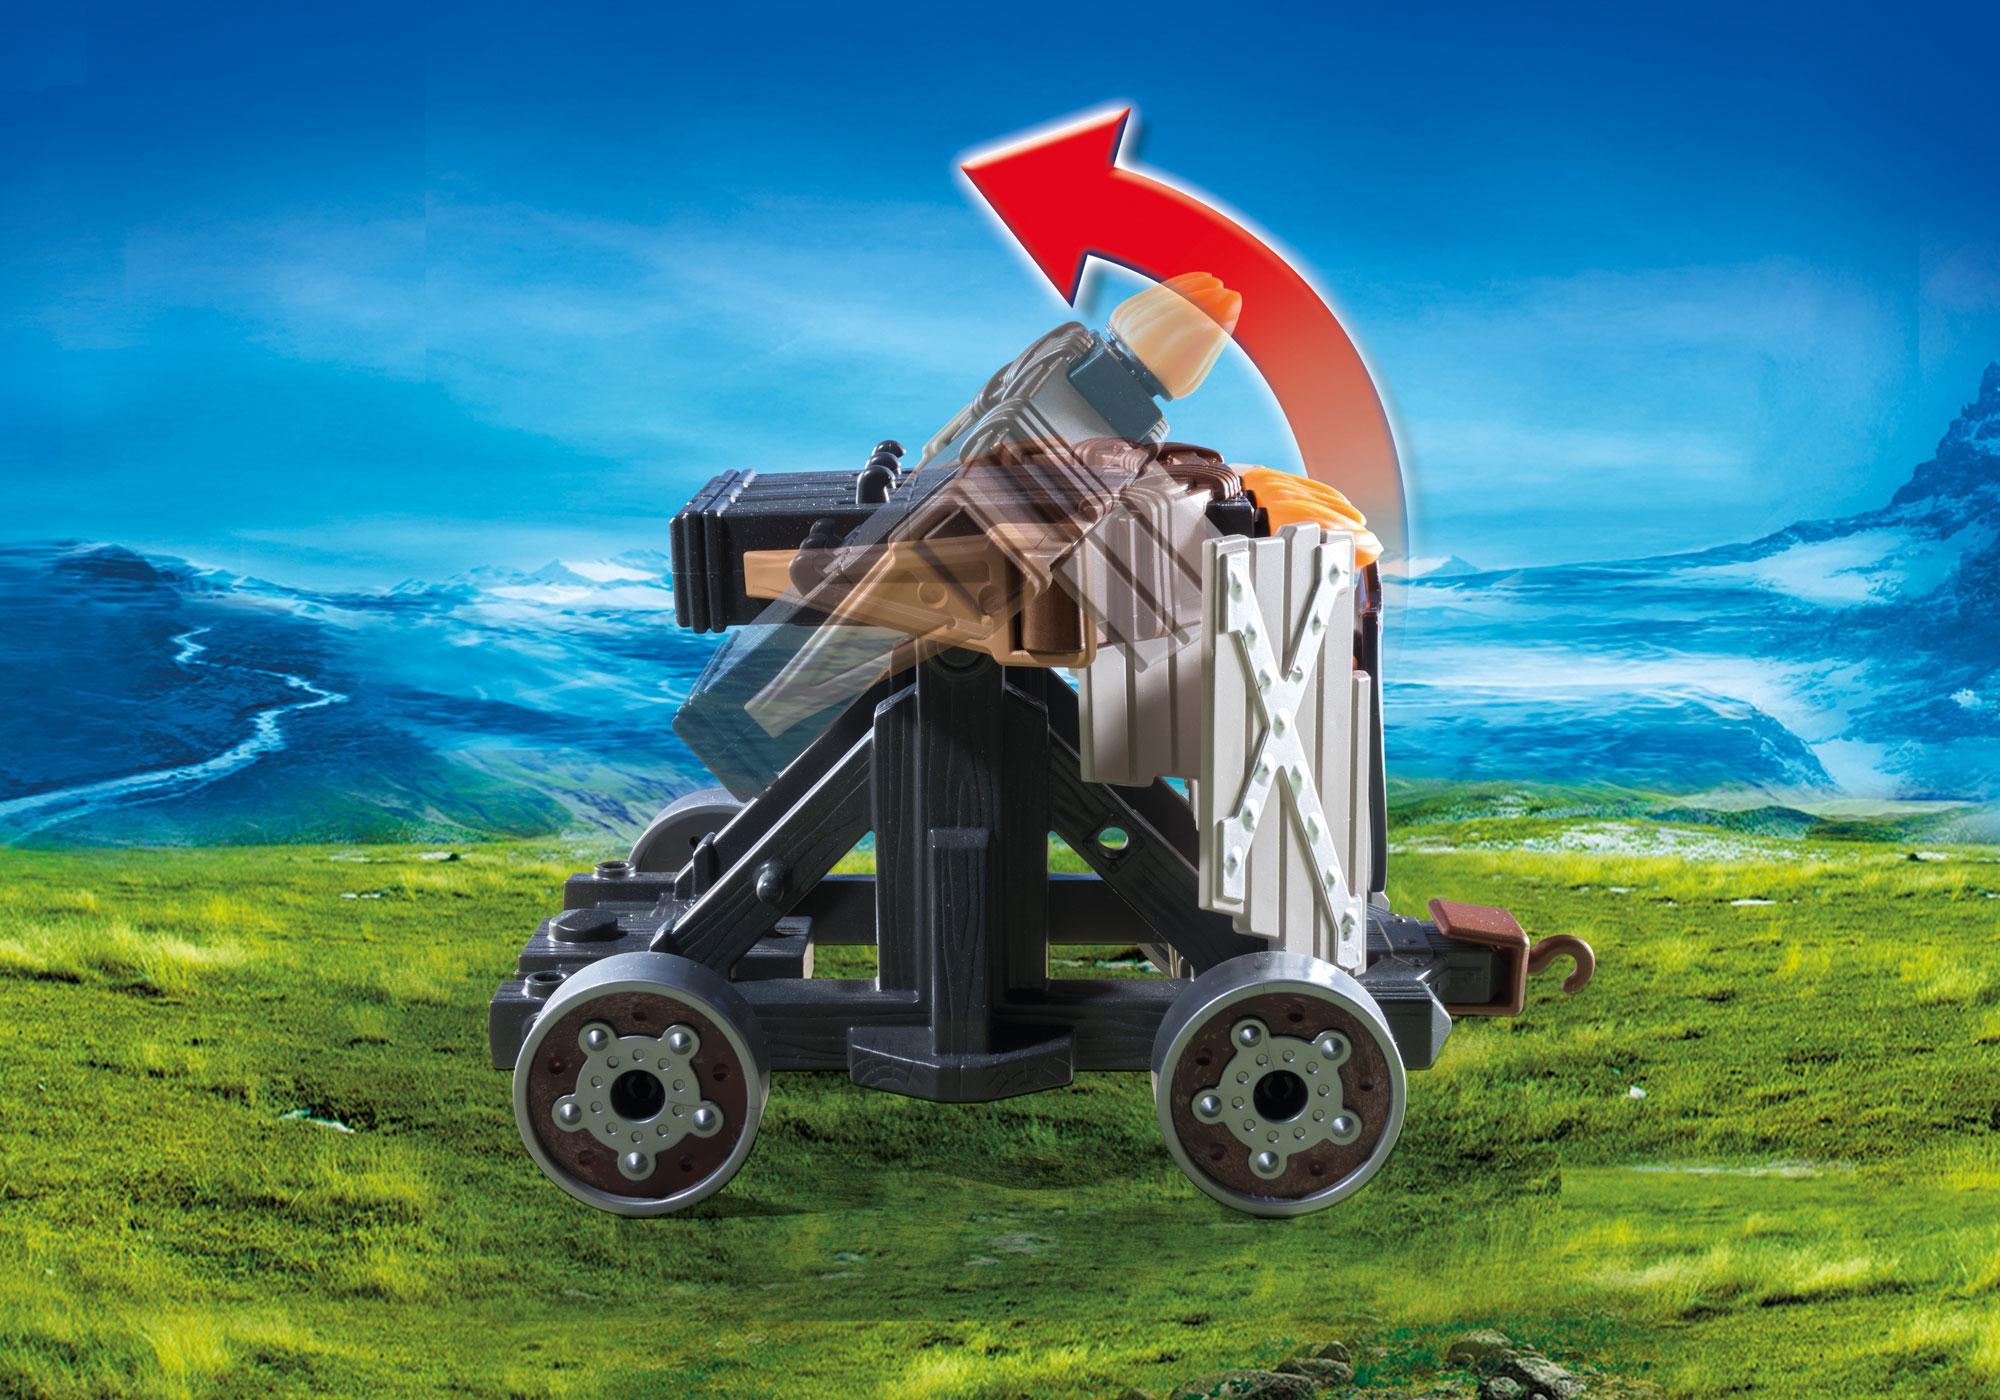 http://media.playmobil.com/i/playmobil/9341_product_extra3/Char de combat avec baliste et nains